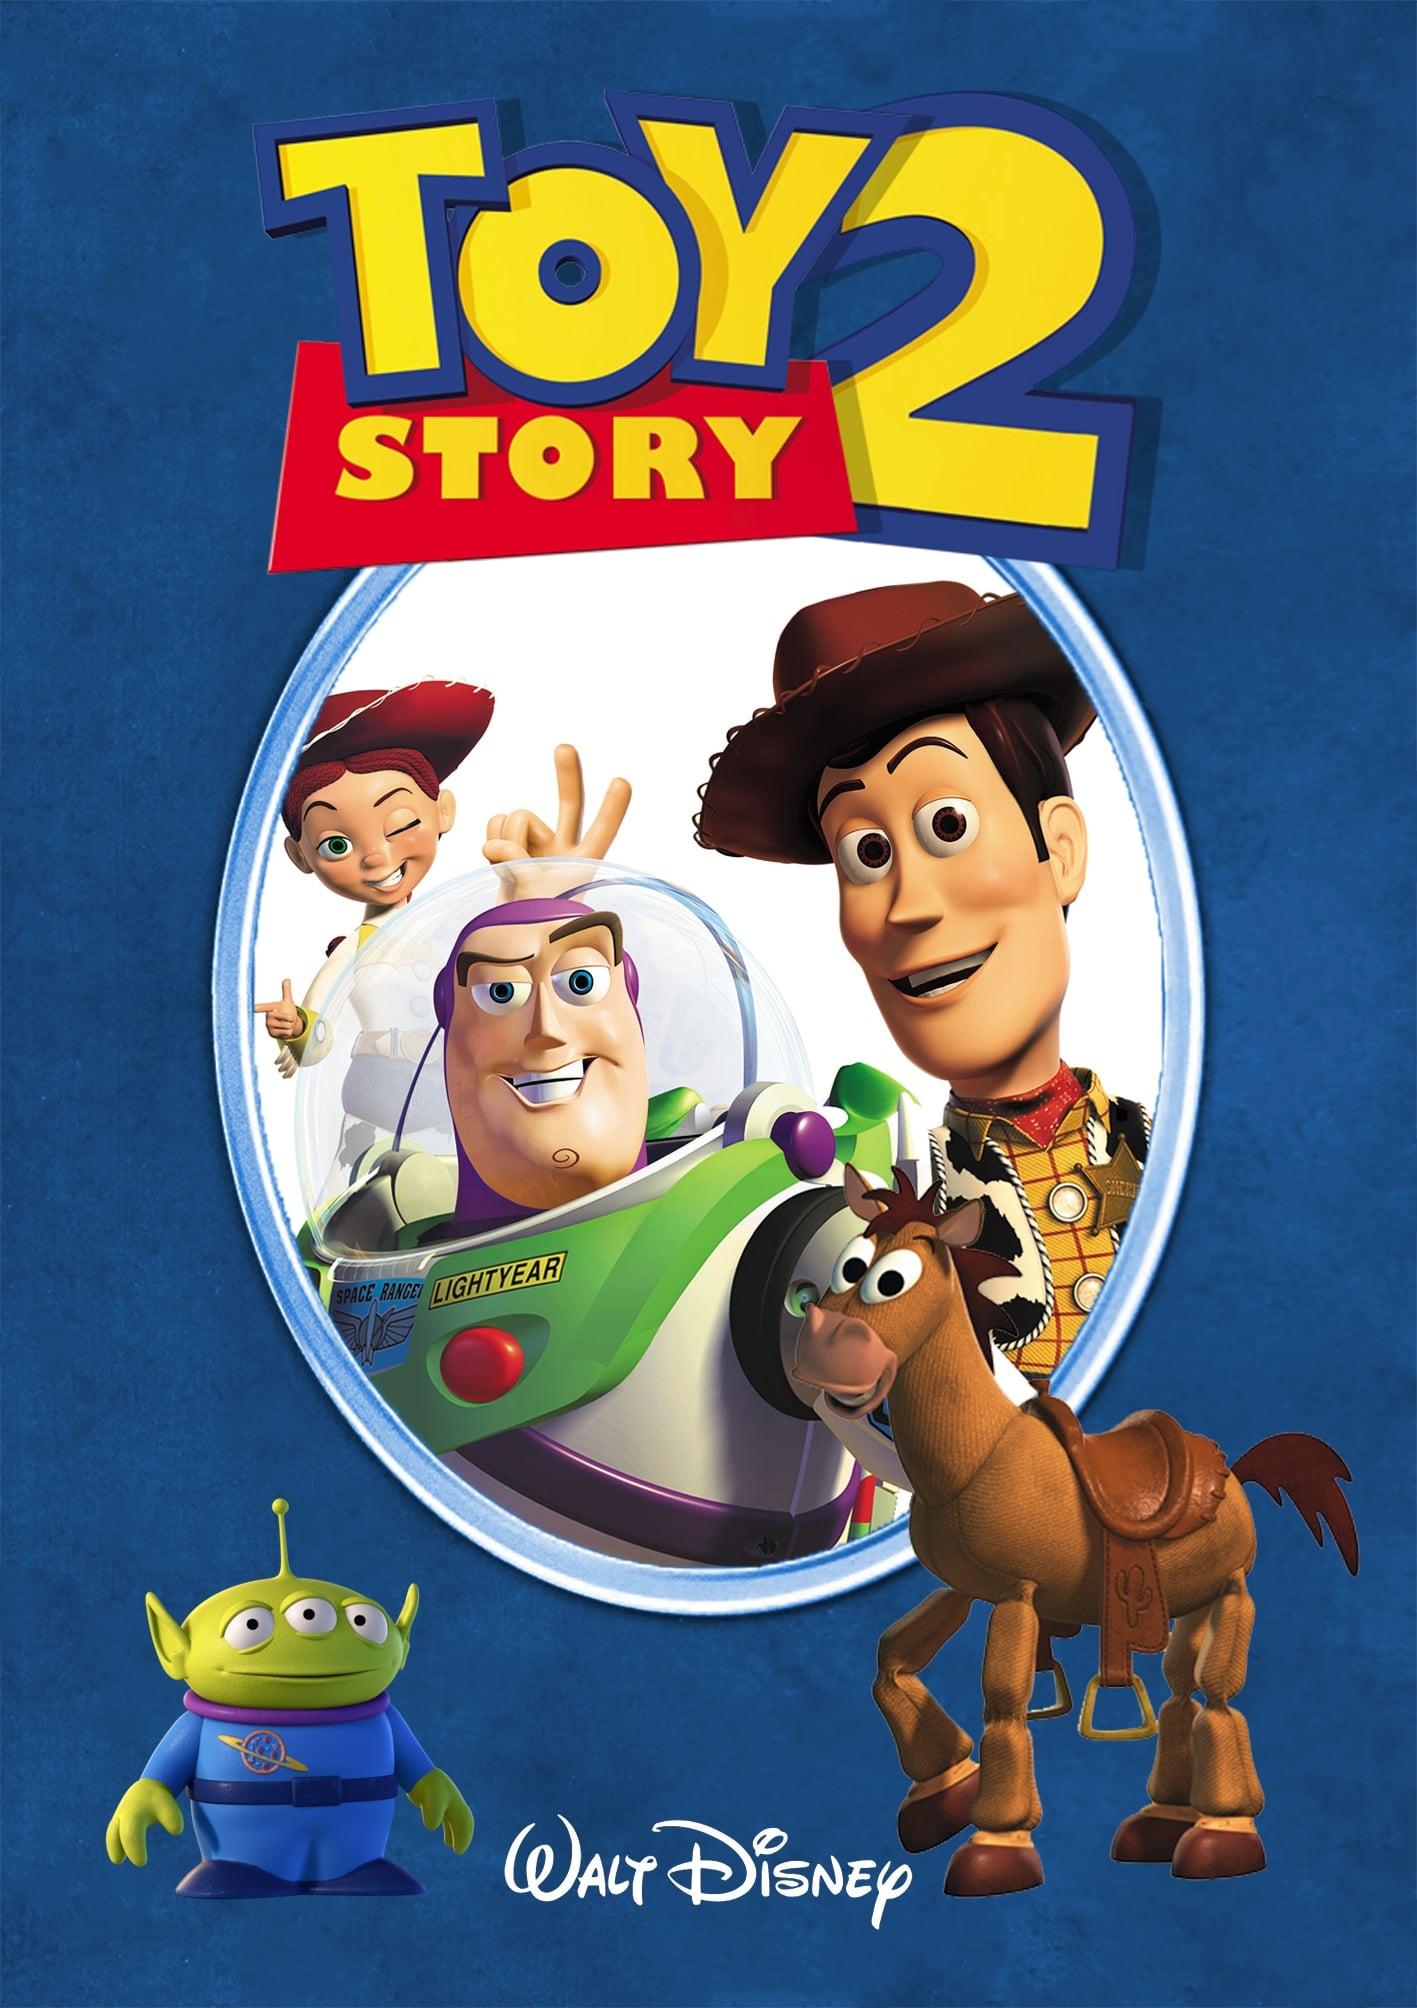 Toy Story 4 | 2019 streaming ita | Popcorn Tv